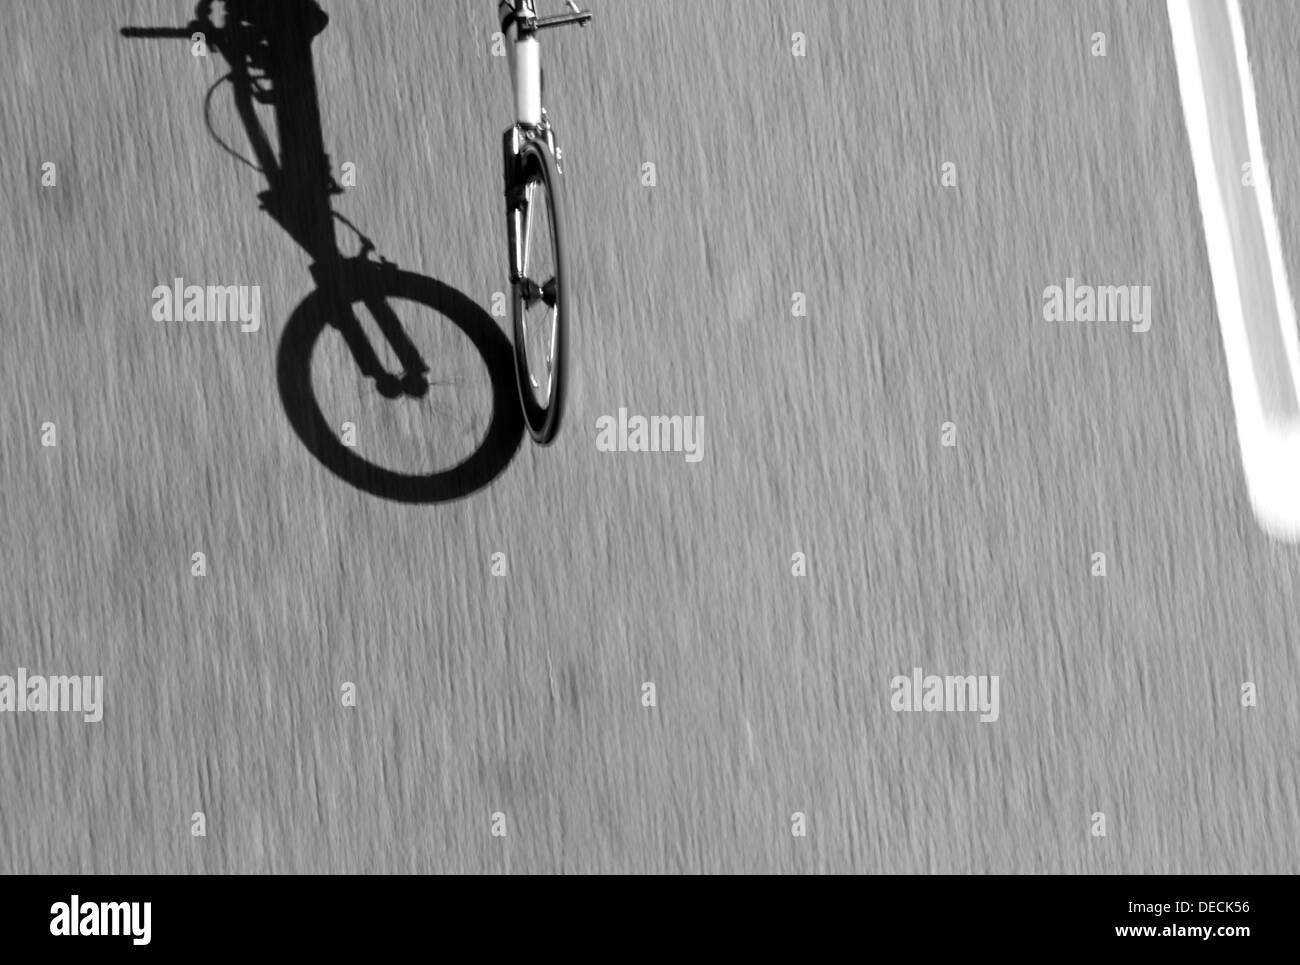 Front wheel motion blur of fast moving speeding racing wheelchair disability bike London marathon 2013 - Stock Image